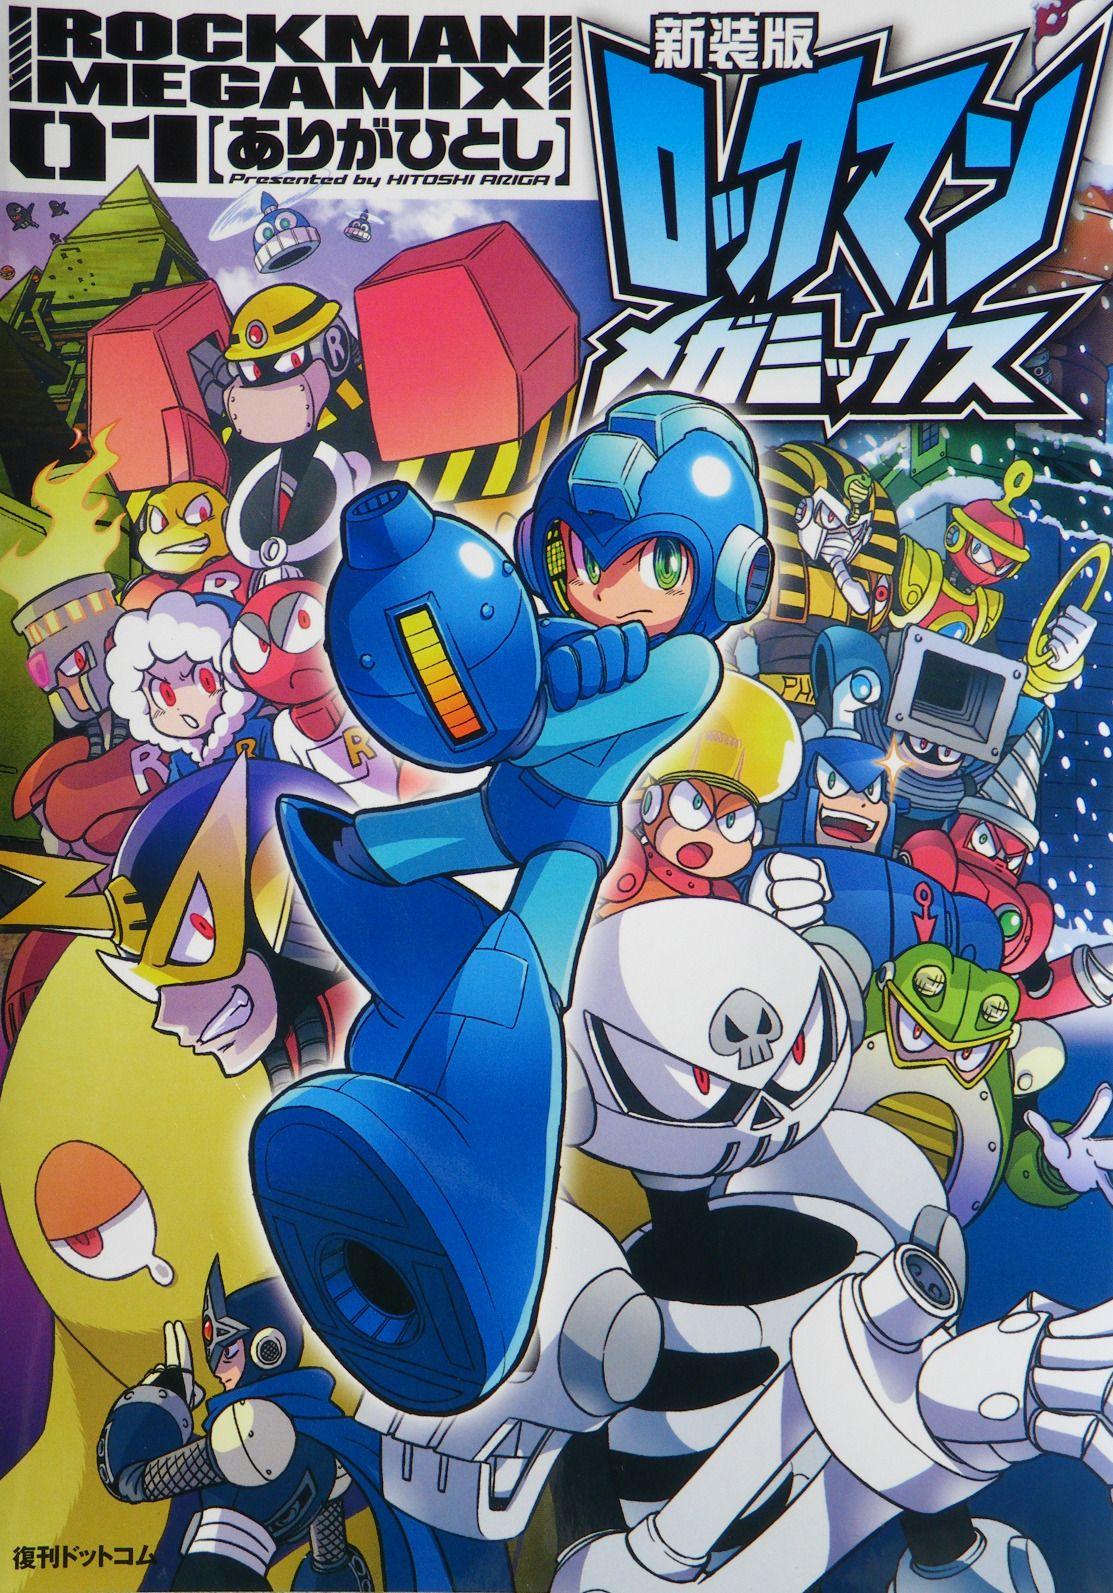 Hentai Arcade Games in pineikici oniluca on manga, comix, games, anime, hentai